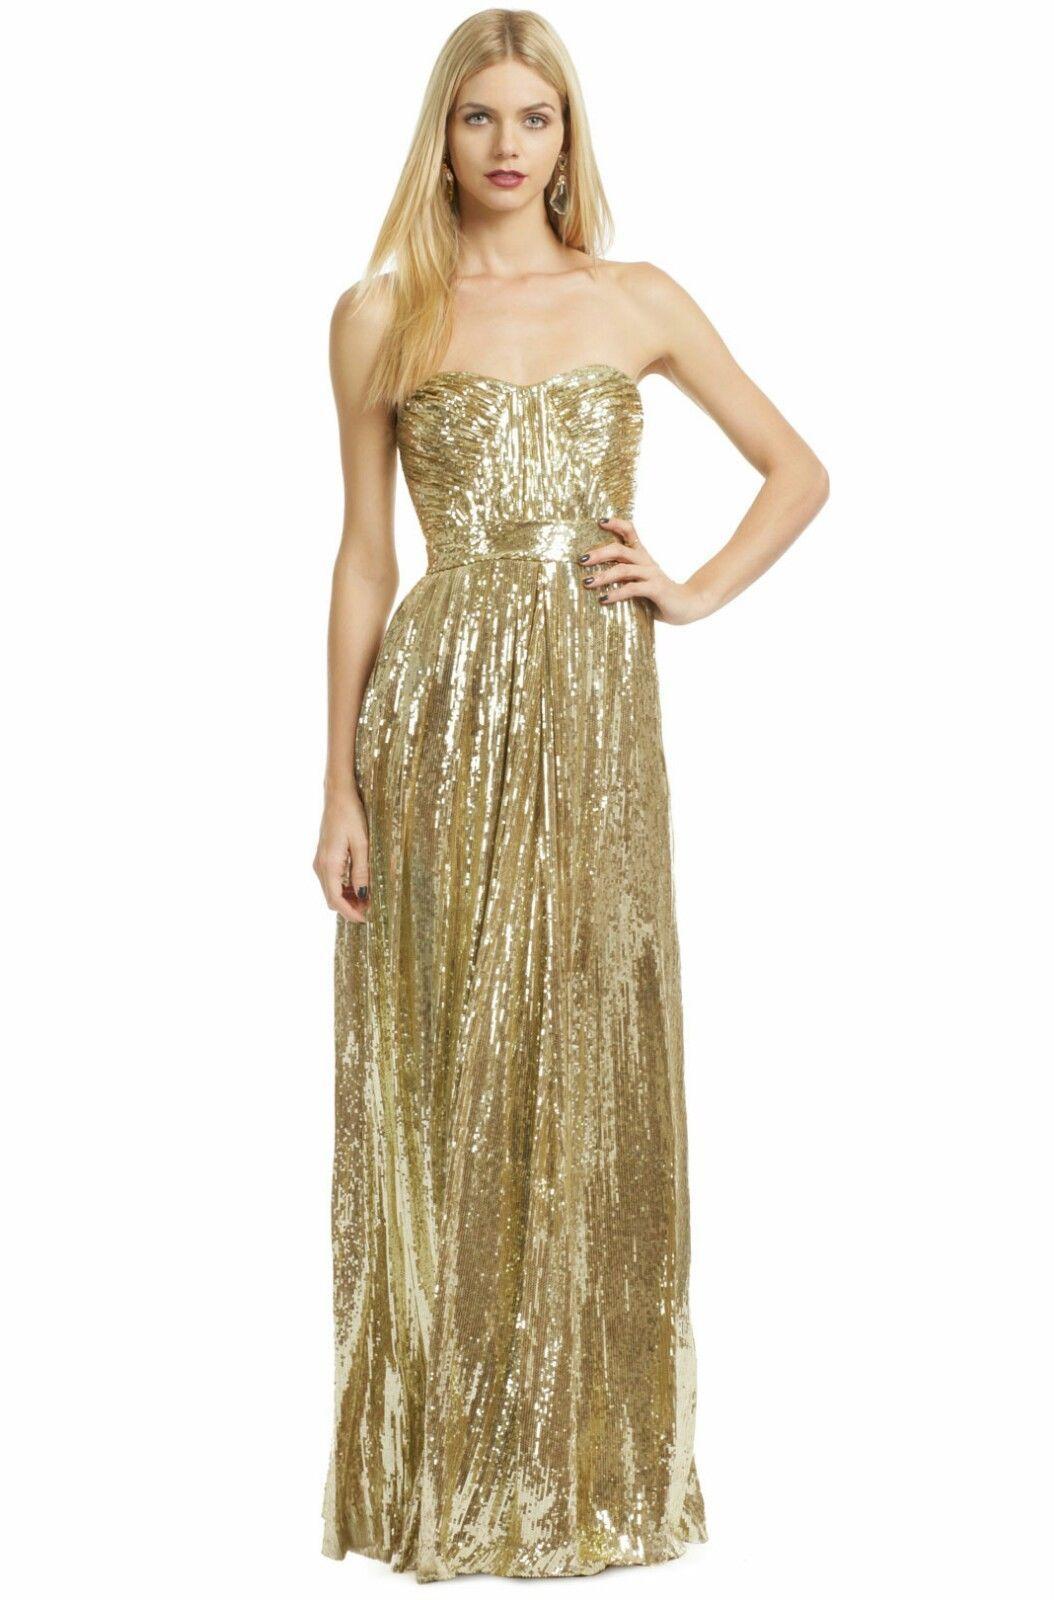 BADGLEY MISCHKA STUNNING GOLD SILK SEQUIN RUNWAY PREGNACY WEDDING DRESS GOWN  4